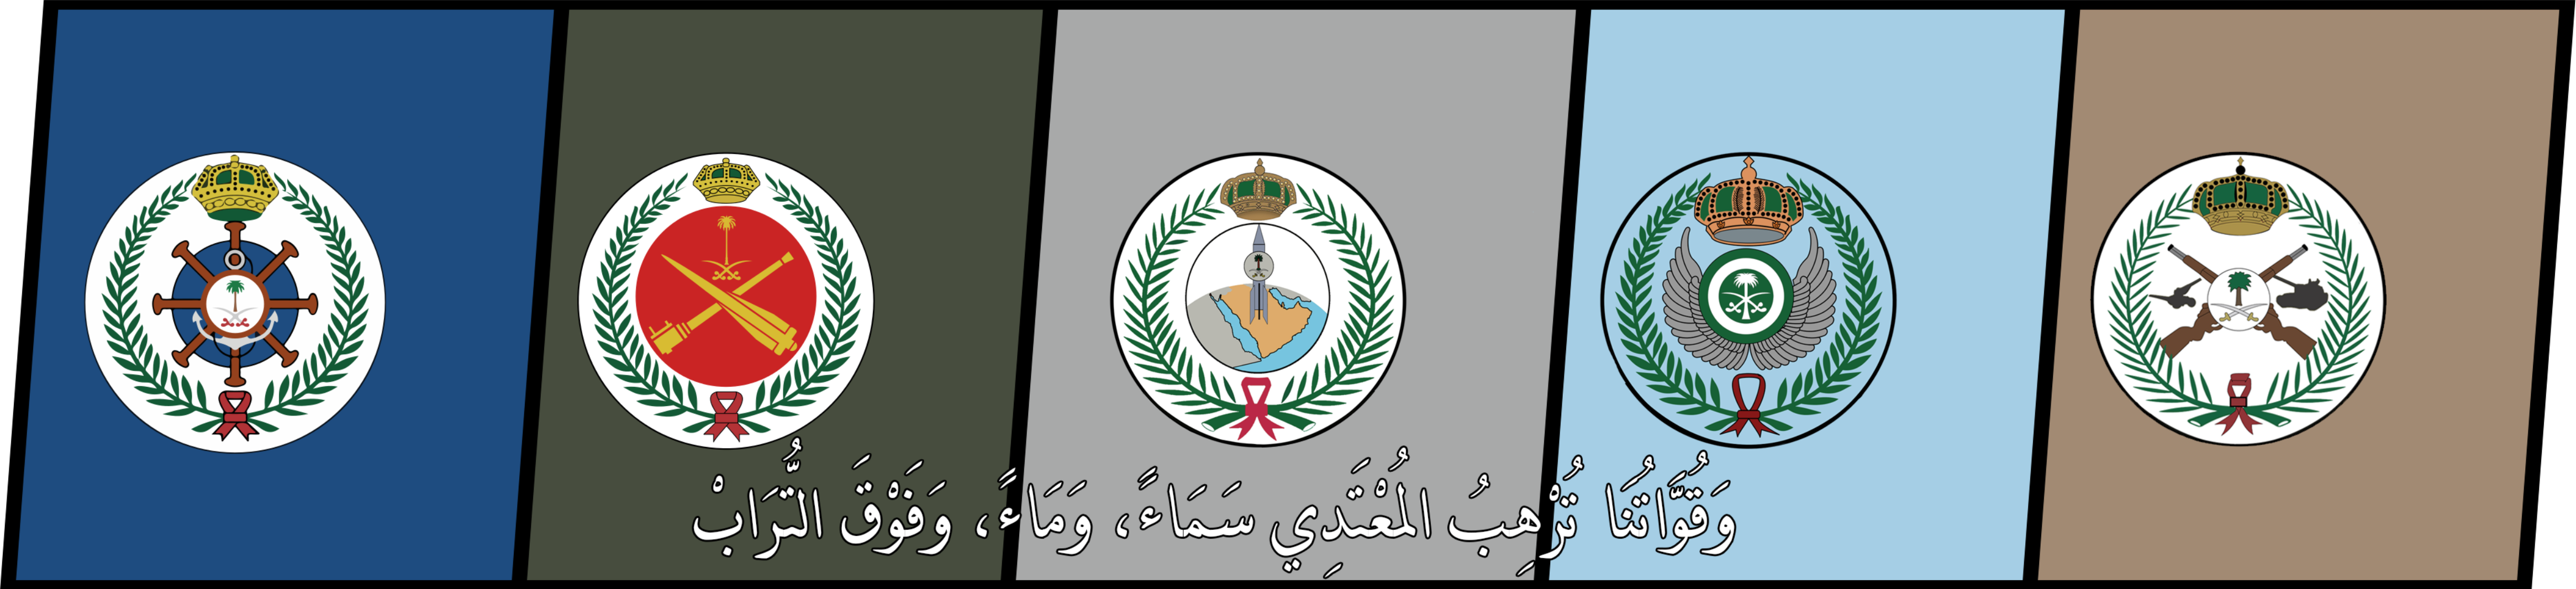 Arabia svg #8, Download drawings